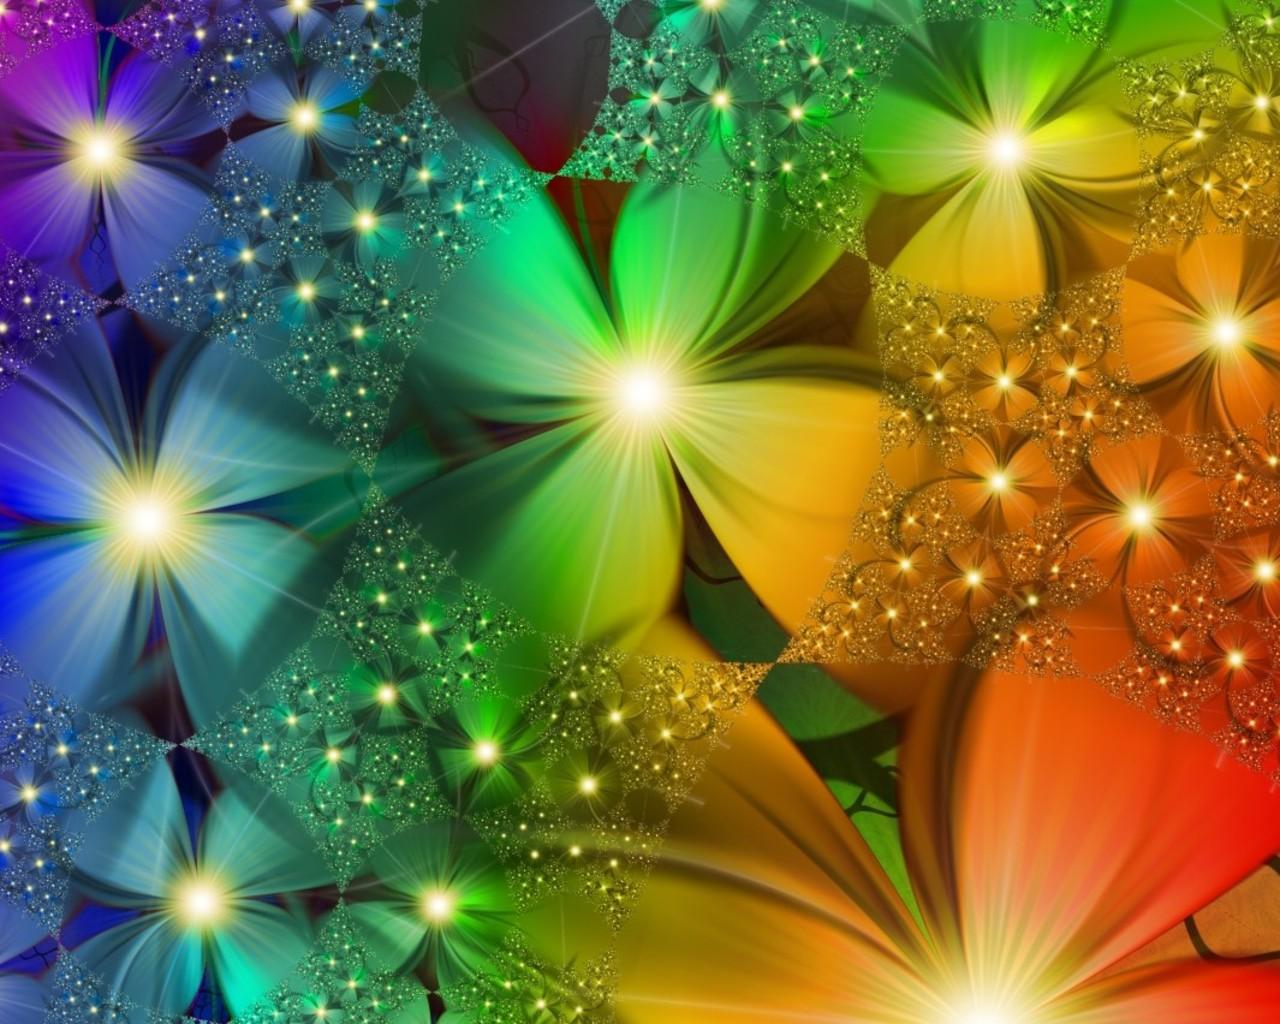 wallpaper Colorful 3D Wallpapers hd wallpaper background desktop 1280x1024